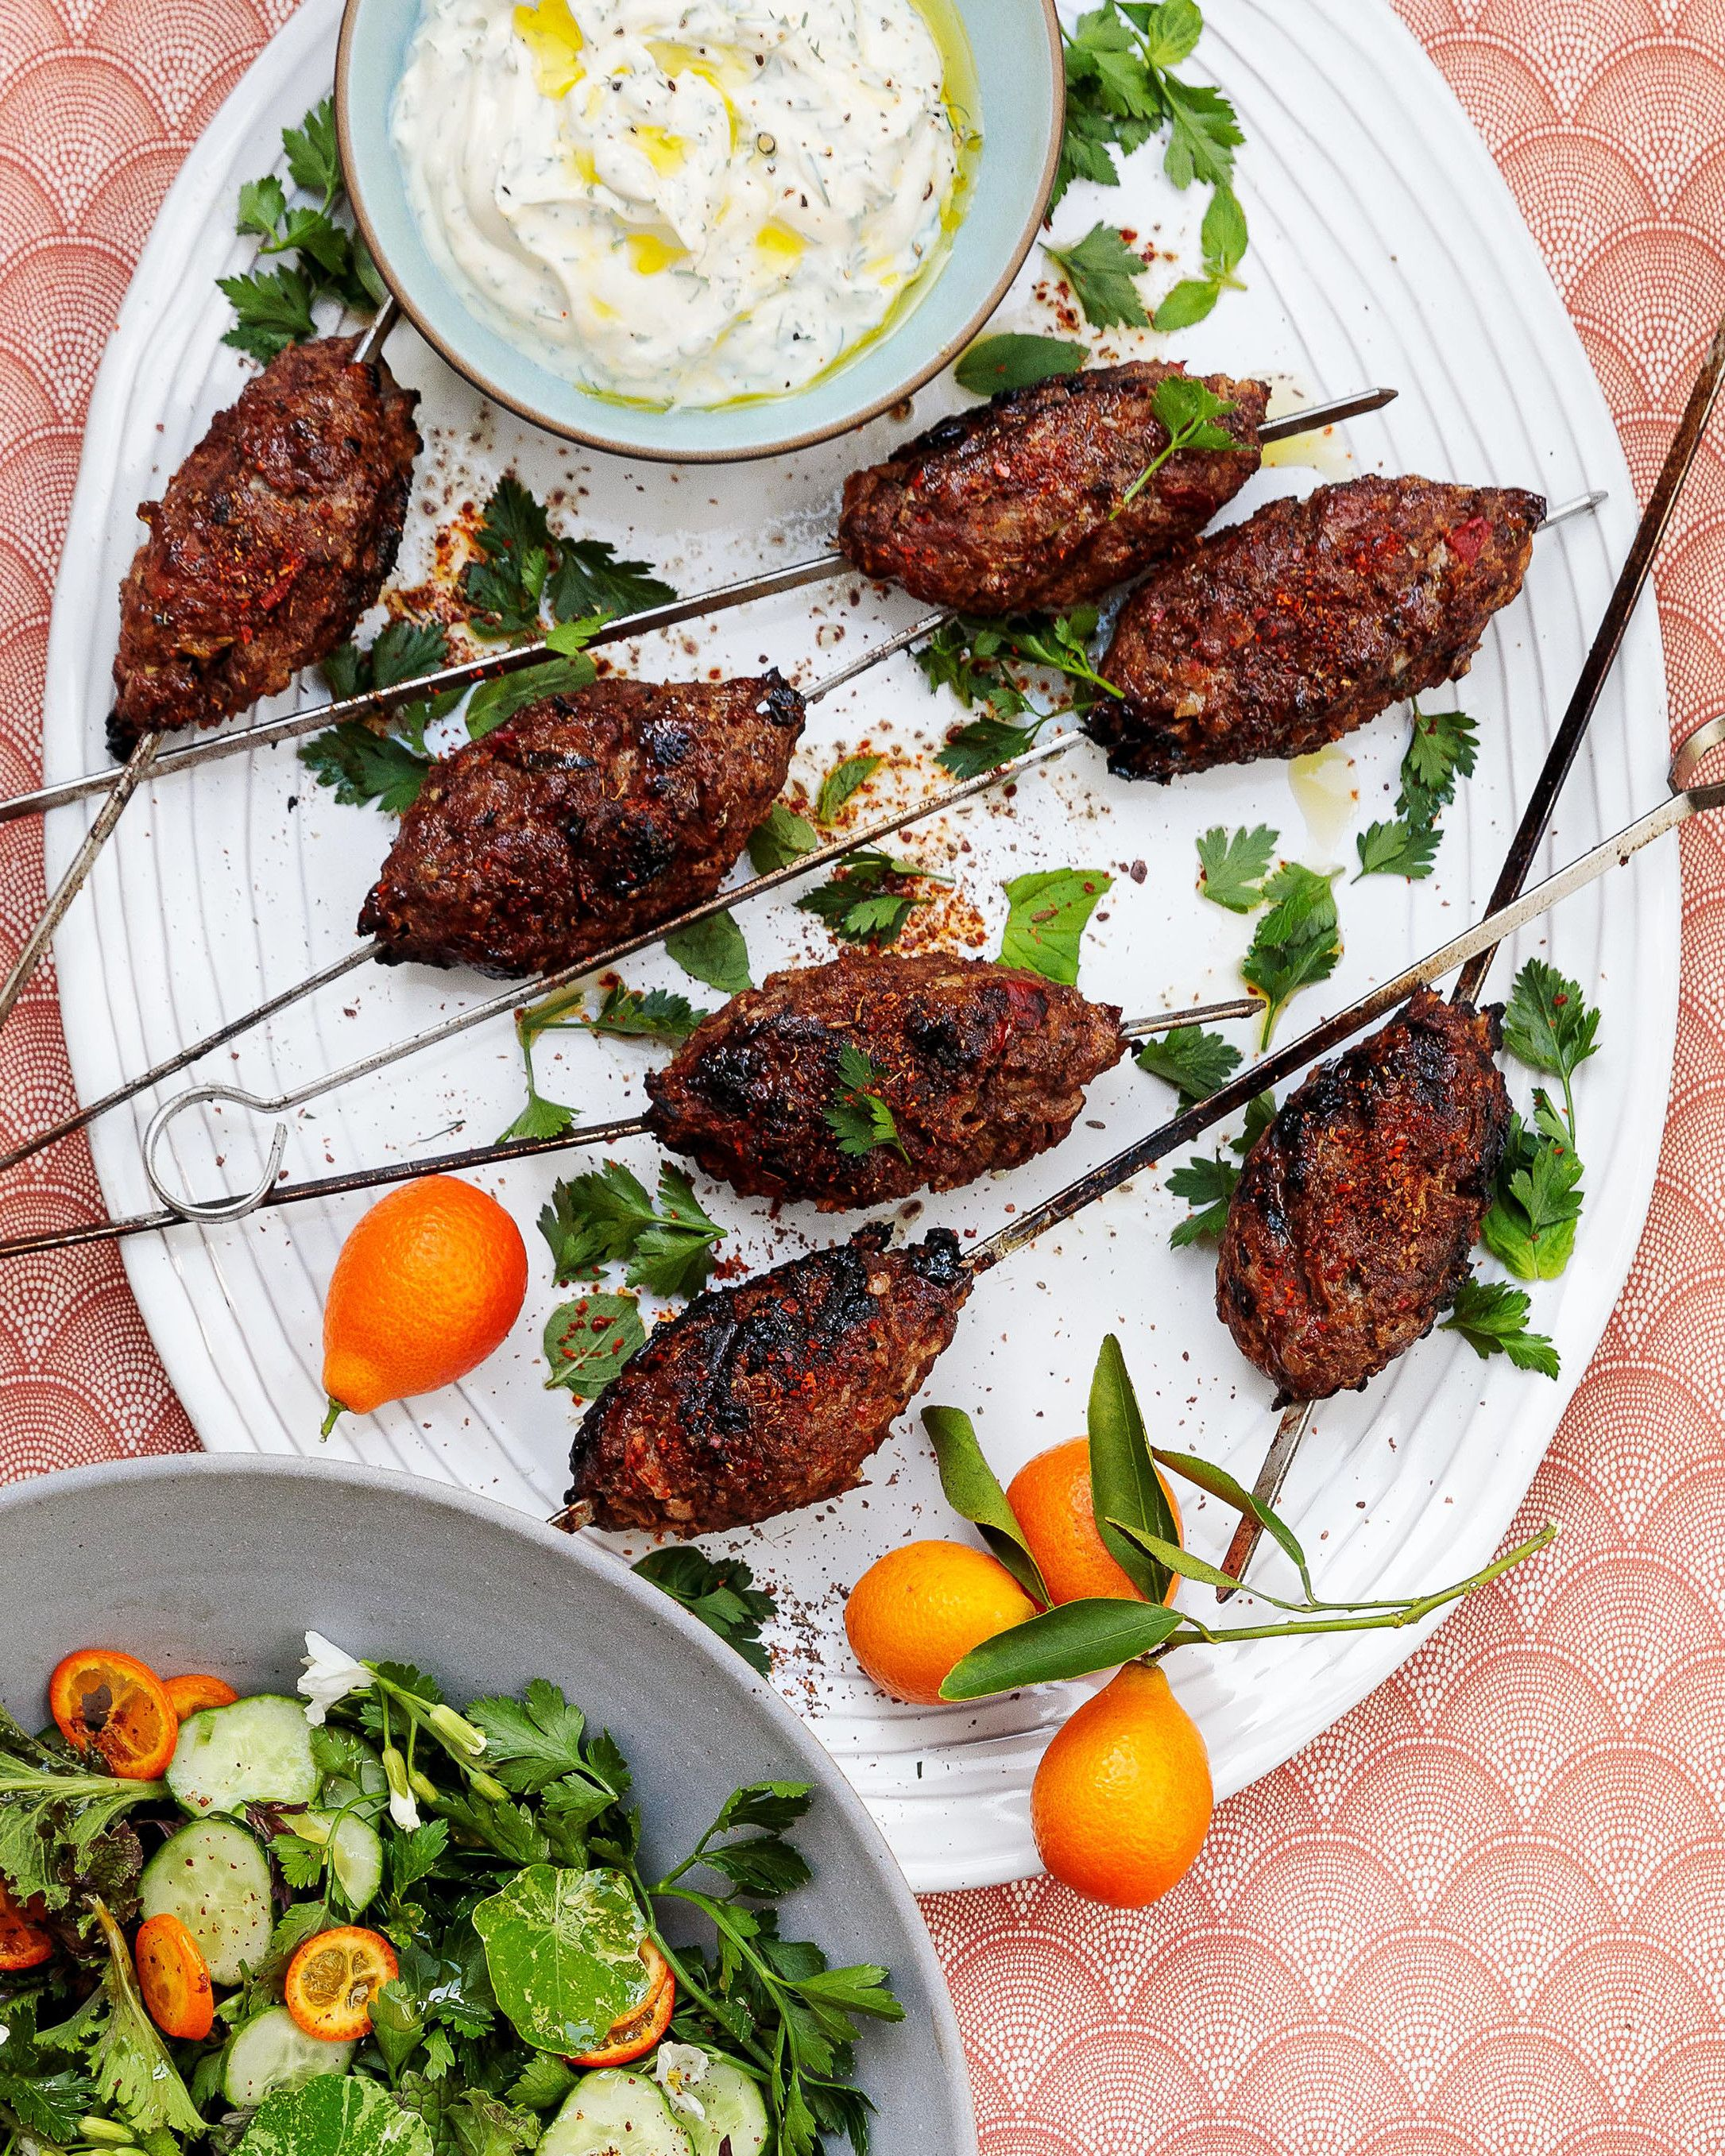 Lamb Kebabs With Herbed Yogurt Recipe Recipe Lamb Kebabs Lamb Recipes Appetizer Recipes